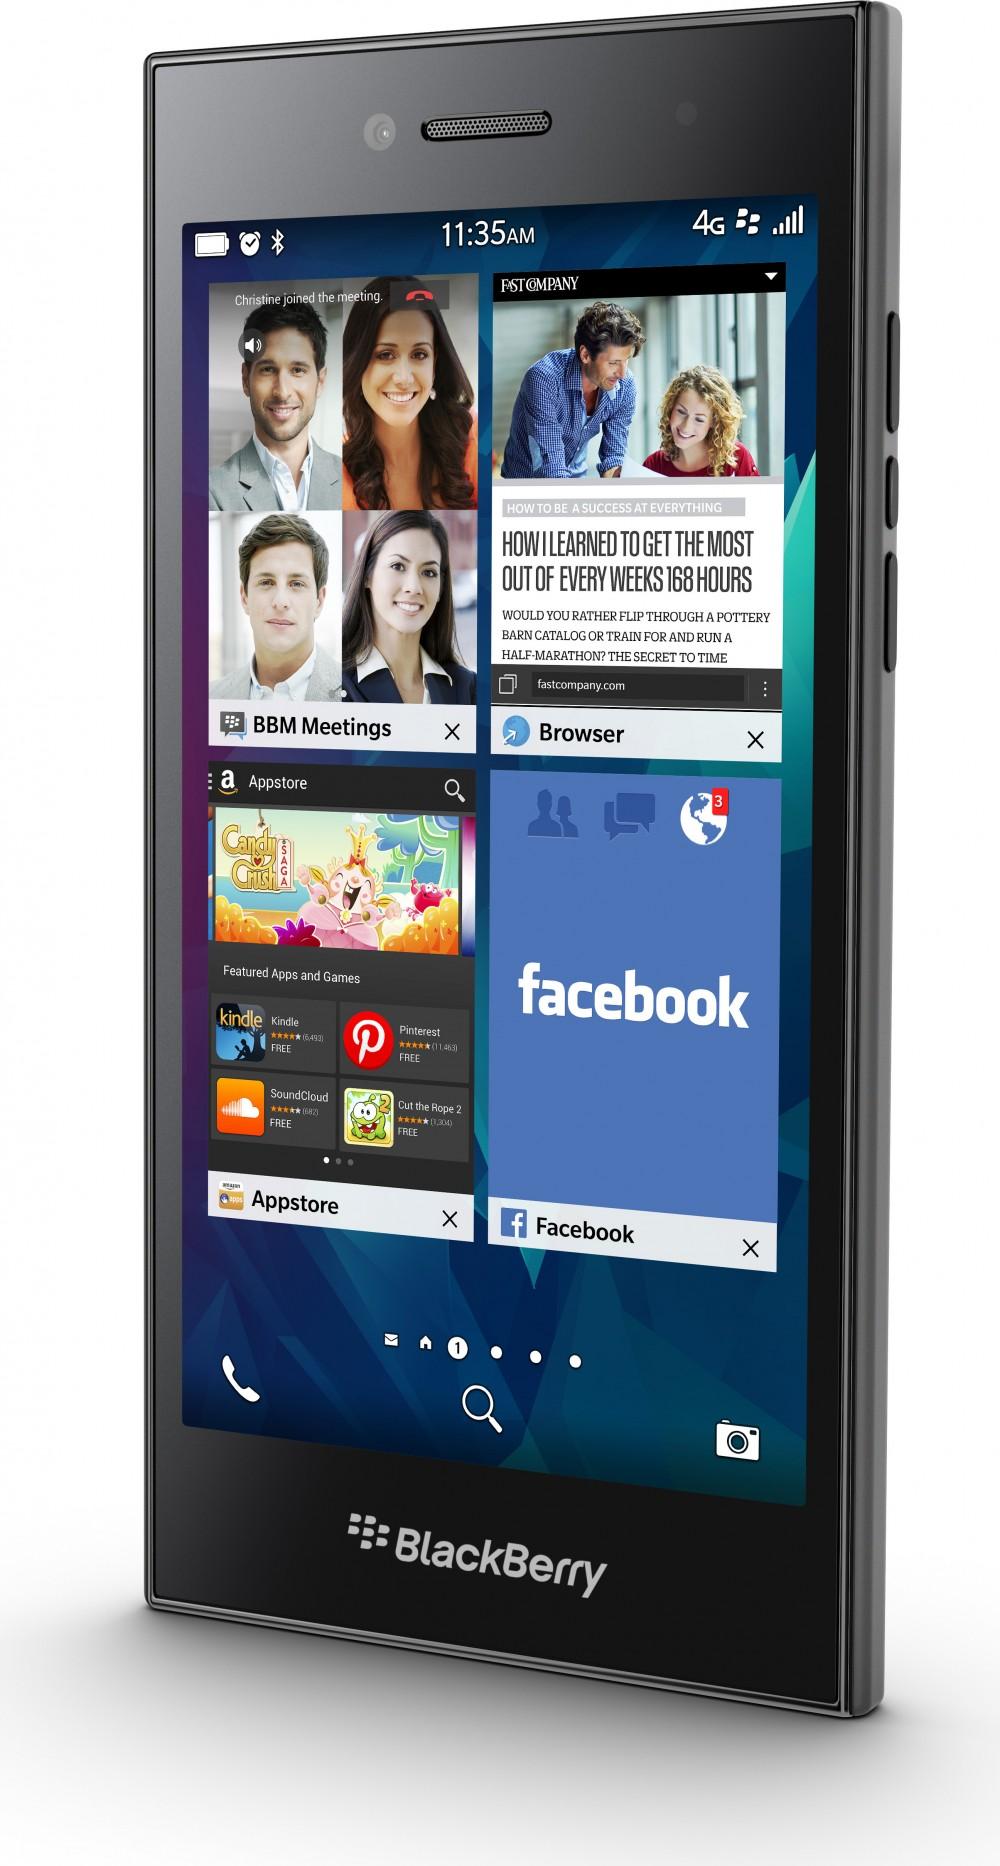 BlackBerry Leap Chính hãng - CellphoneS-3